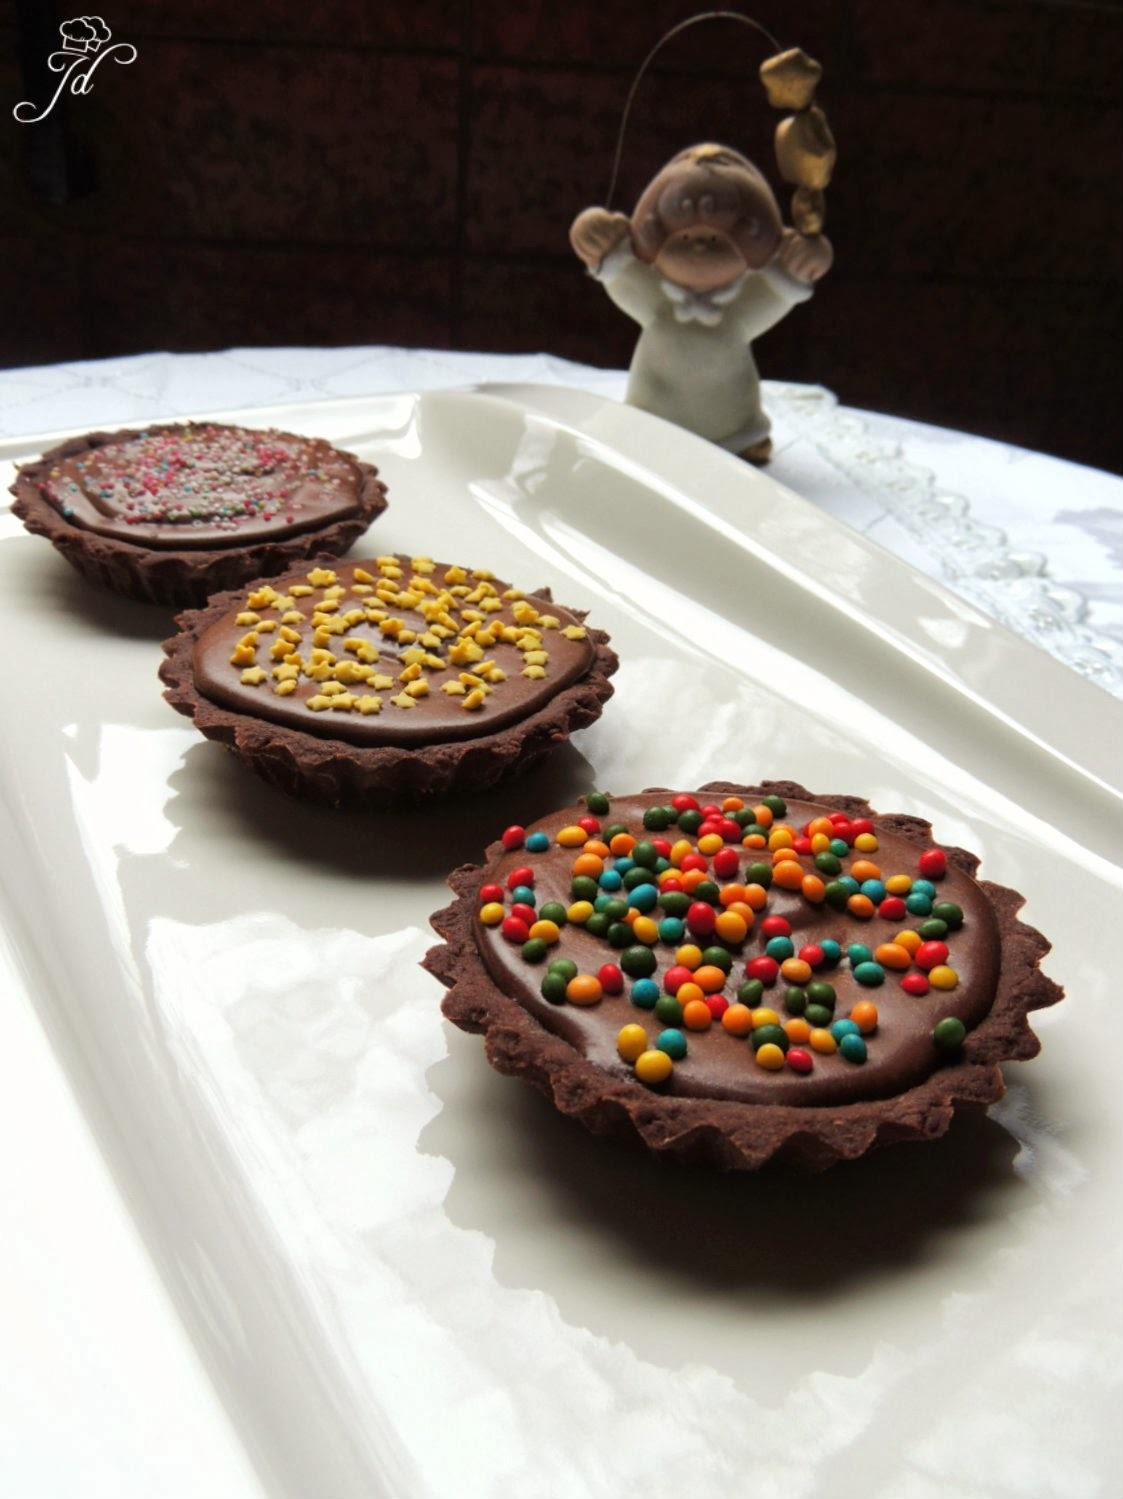 Chocolate truffle tartlets - Čokoladne truffle pitice